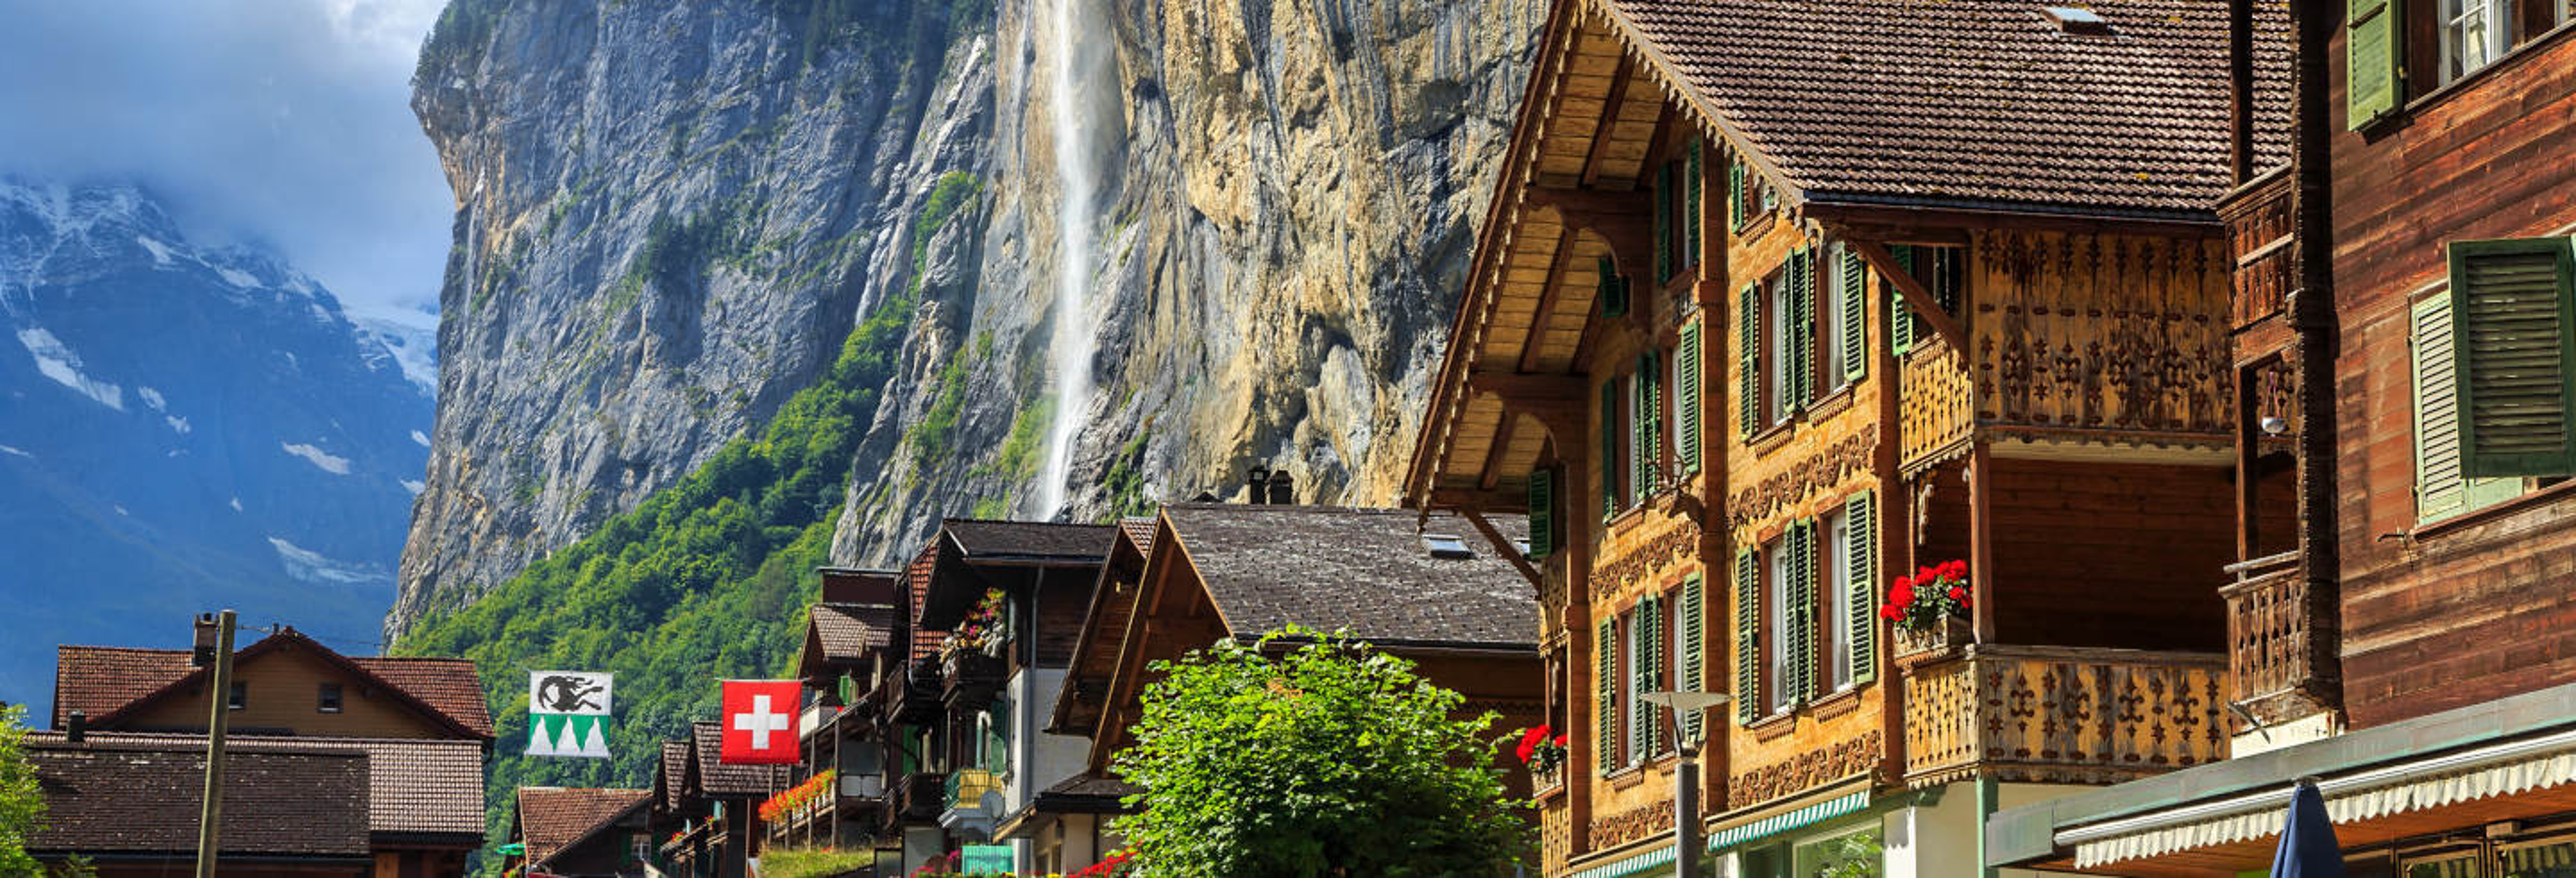 Excursão a Jungfrau